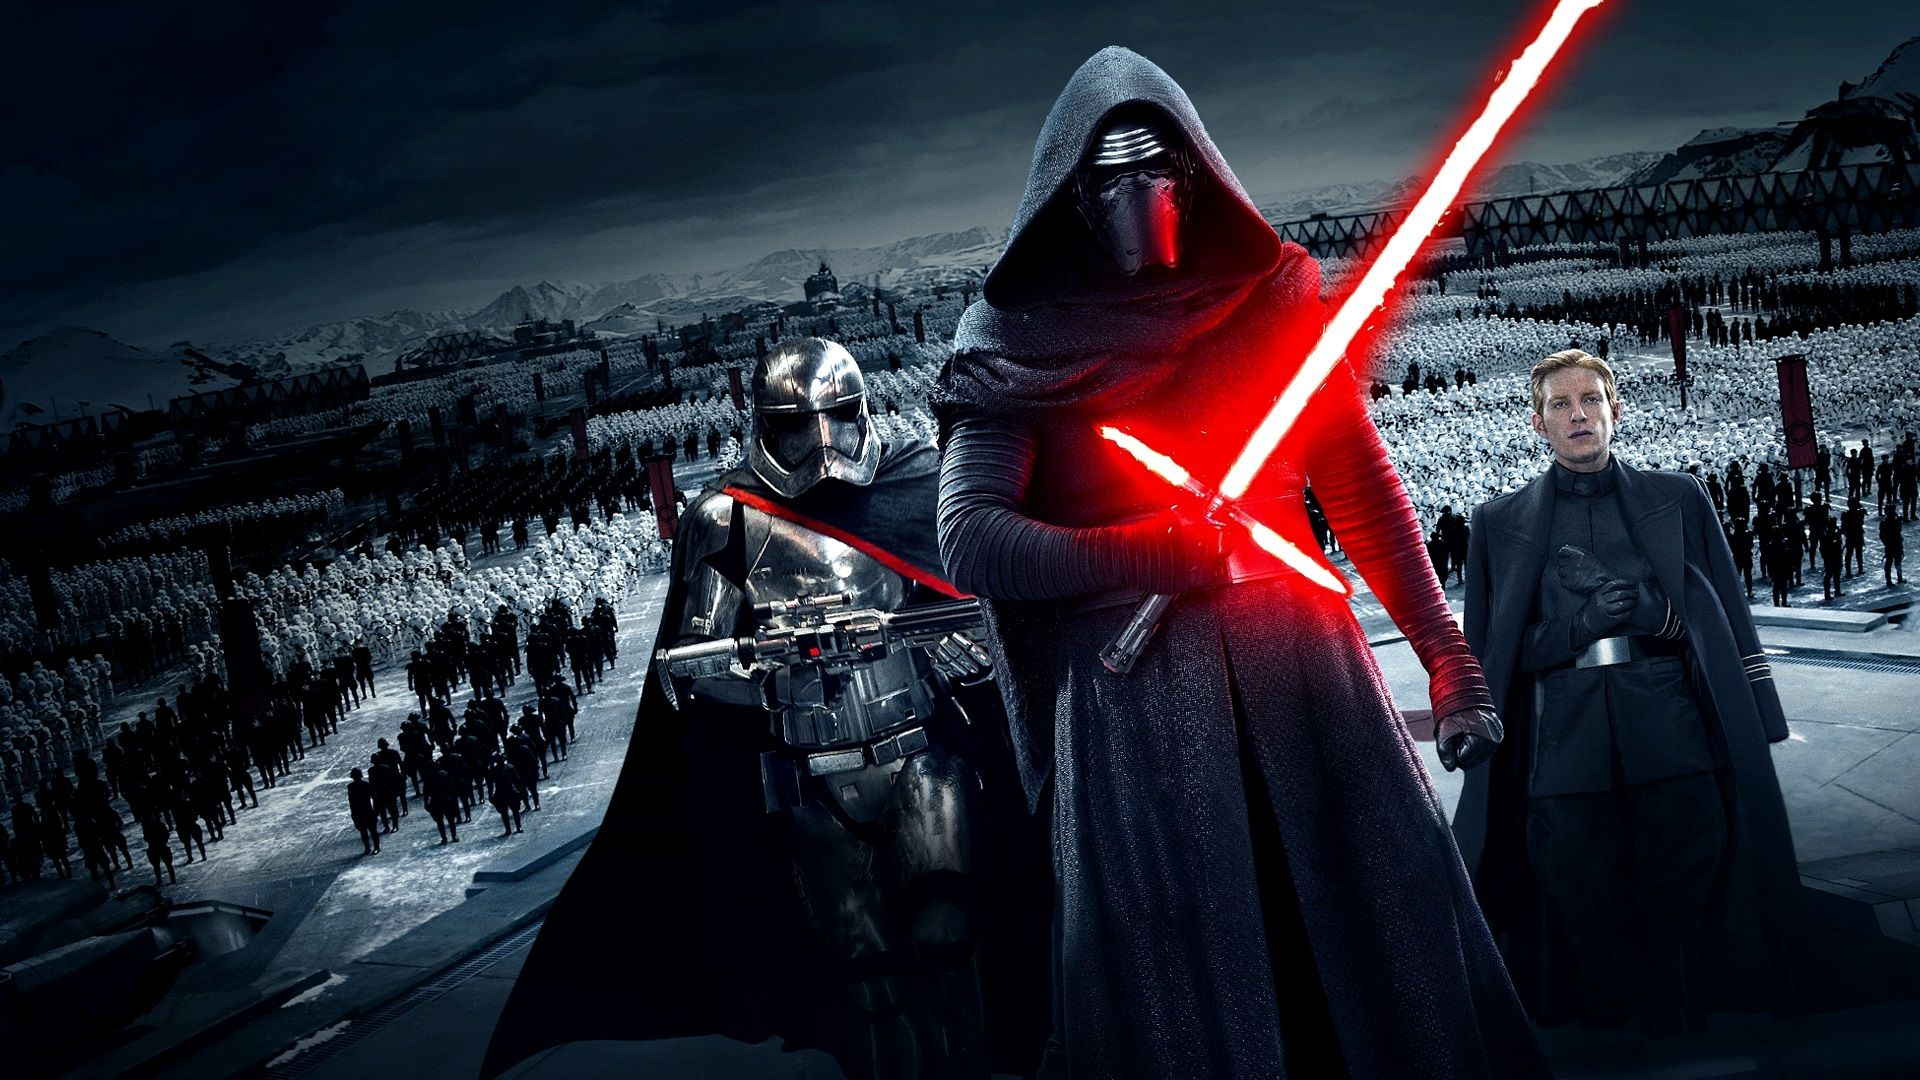 The Return Of The Empire Fond D Ecran Star Wars Star Wars Images Star Wars